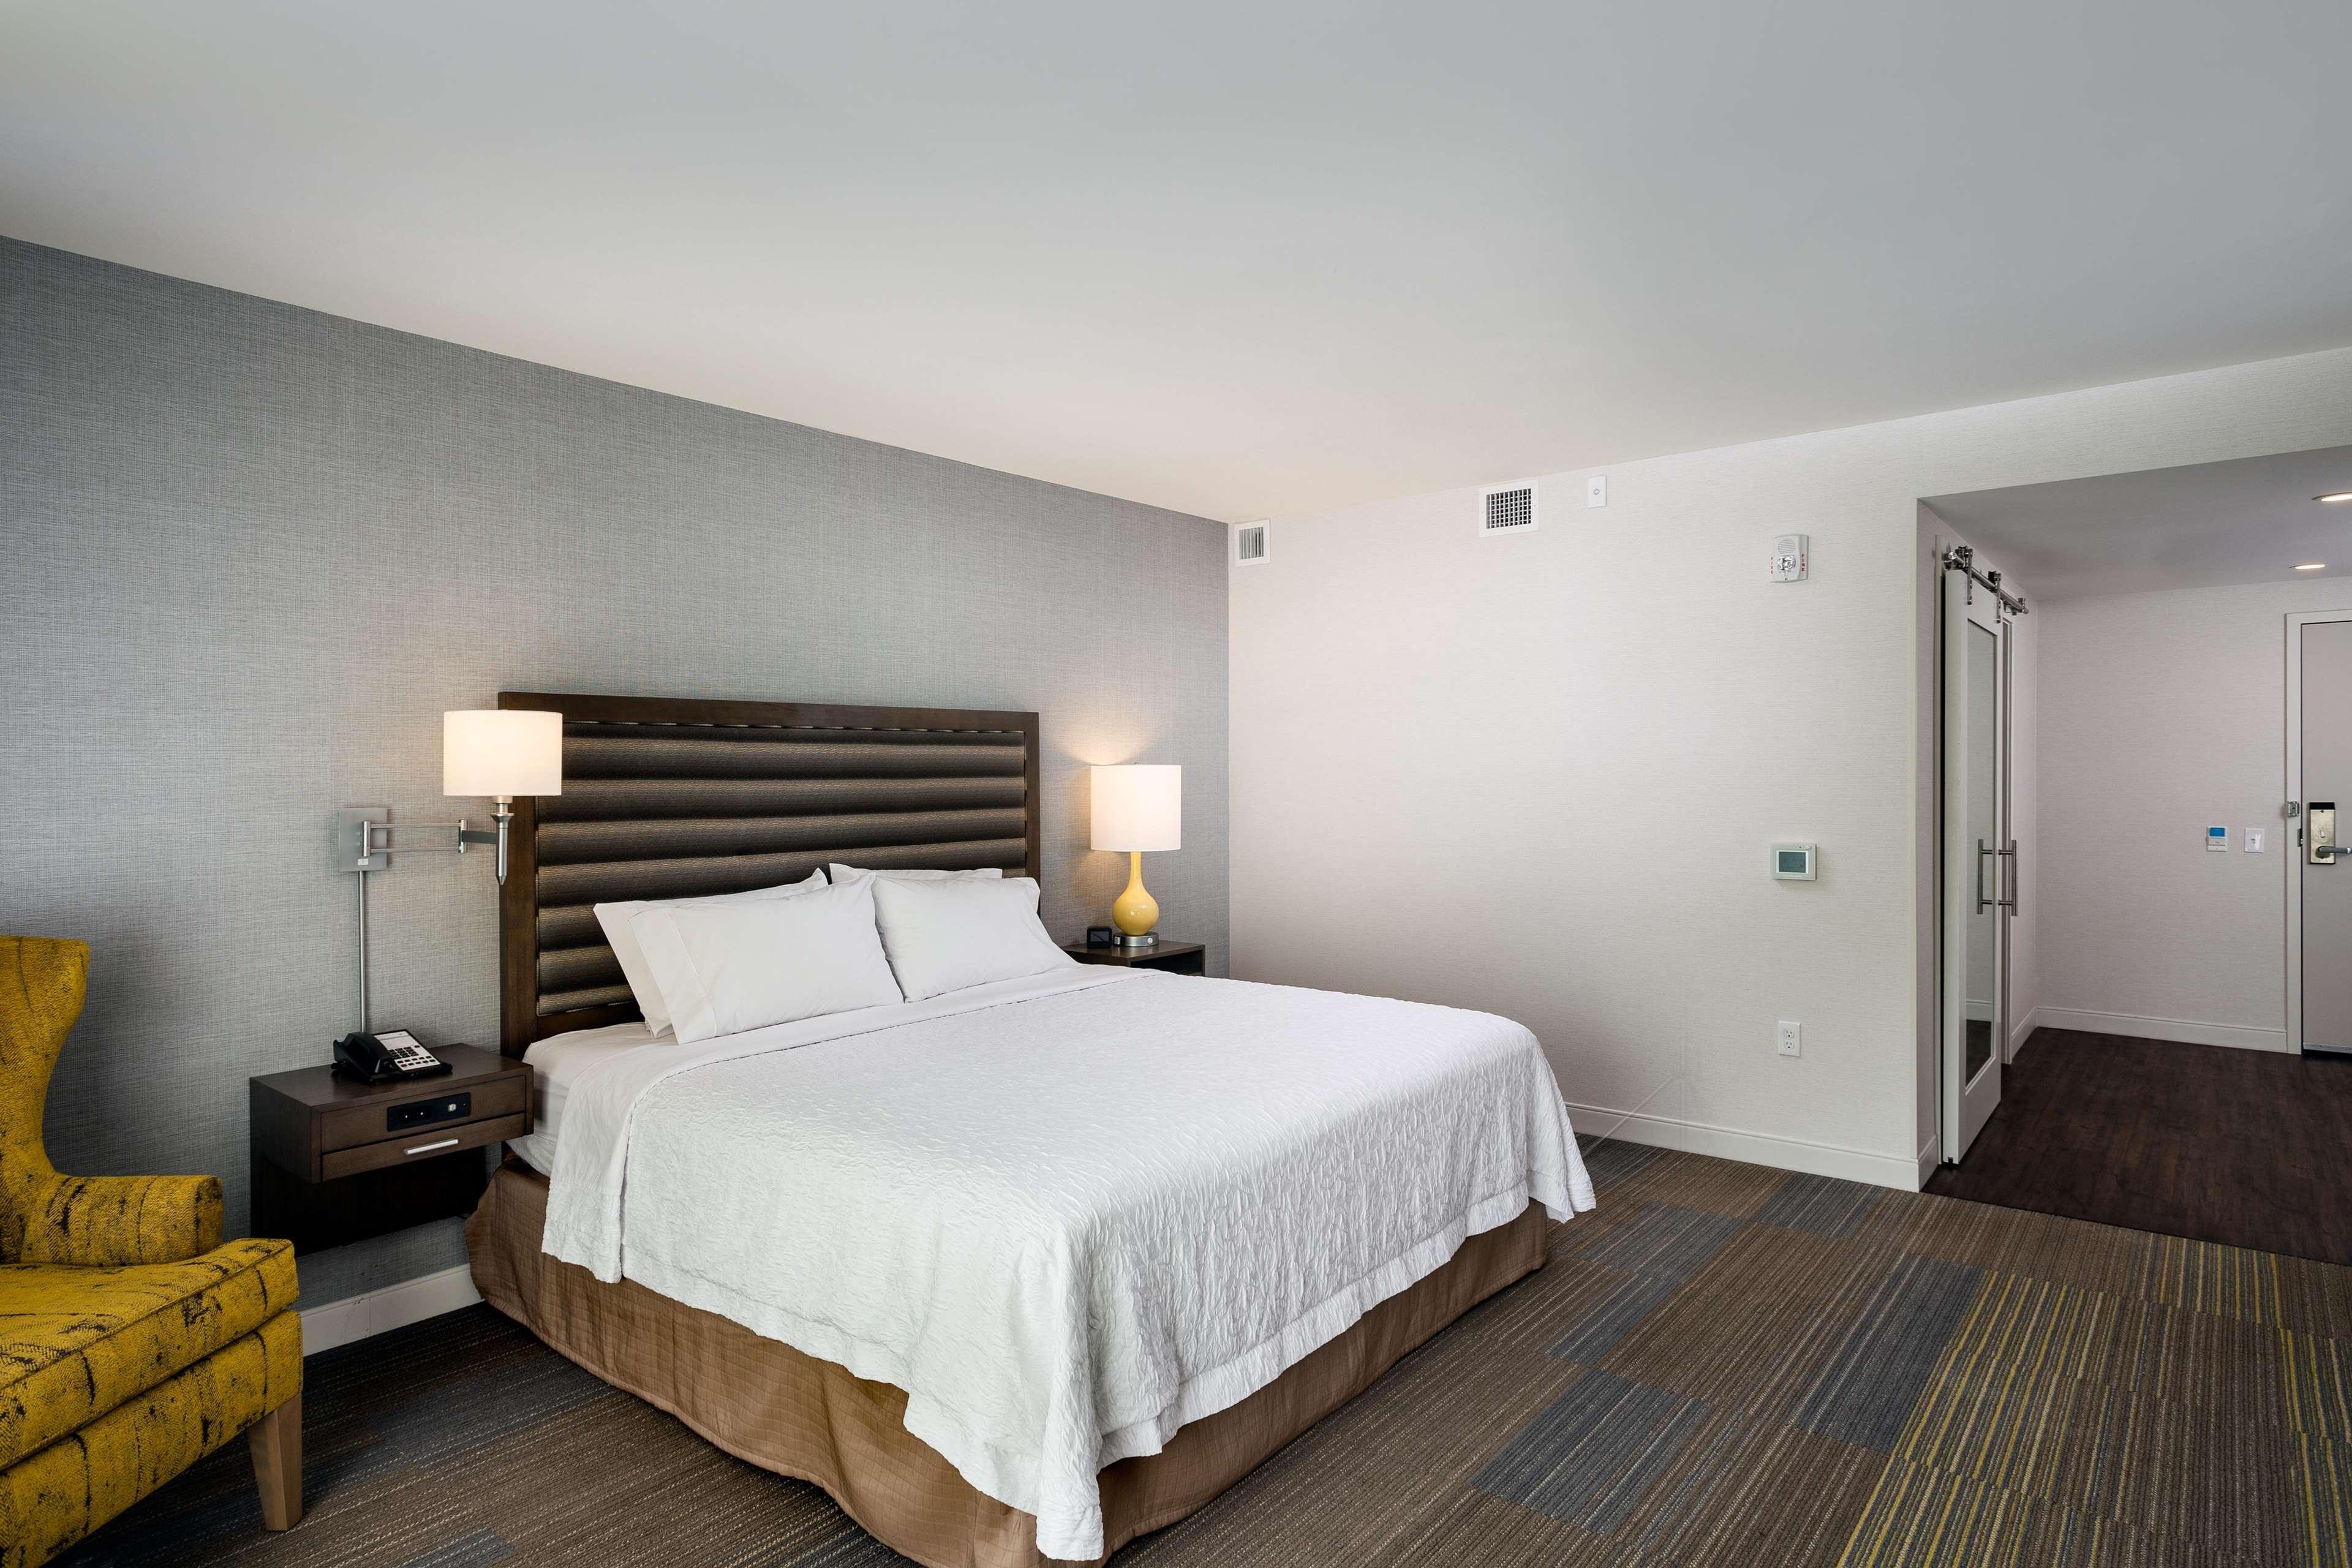 Hampton Inn & Suites by Hilton Seattle/Northgate image 18